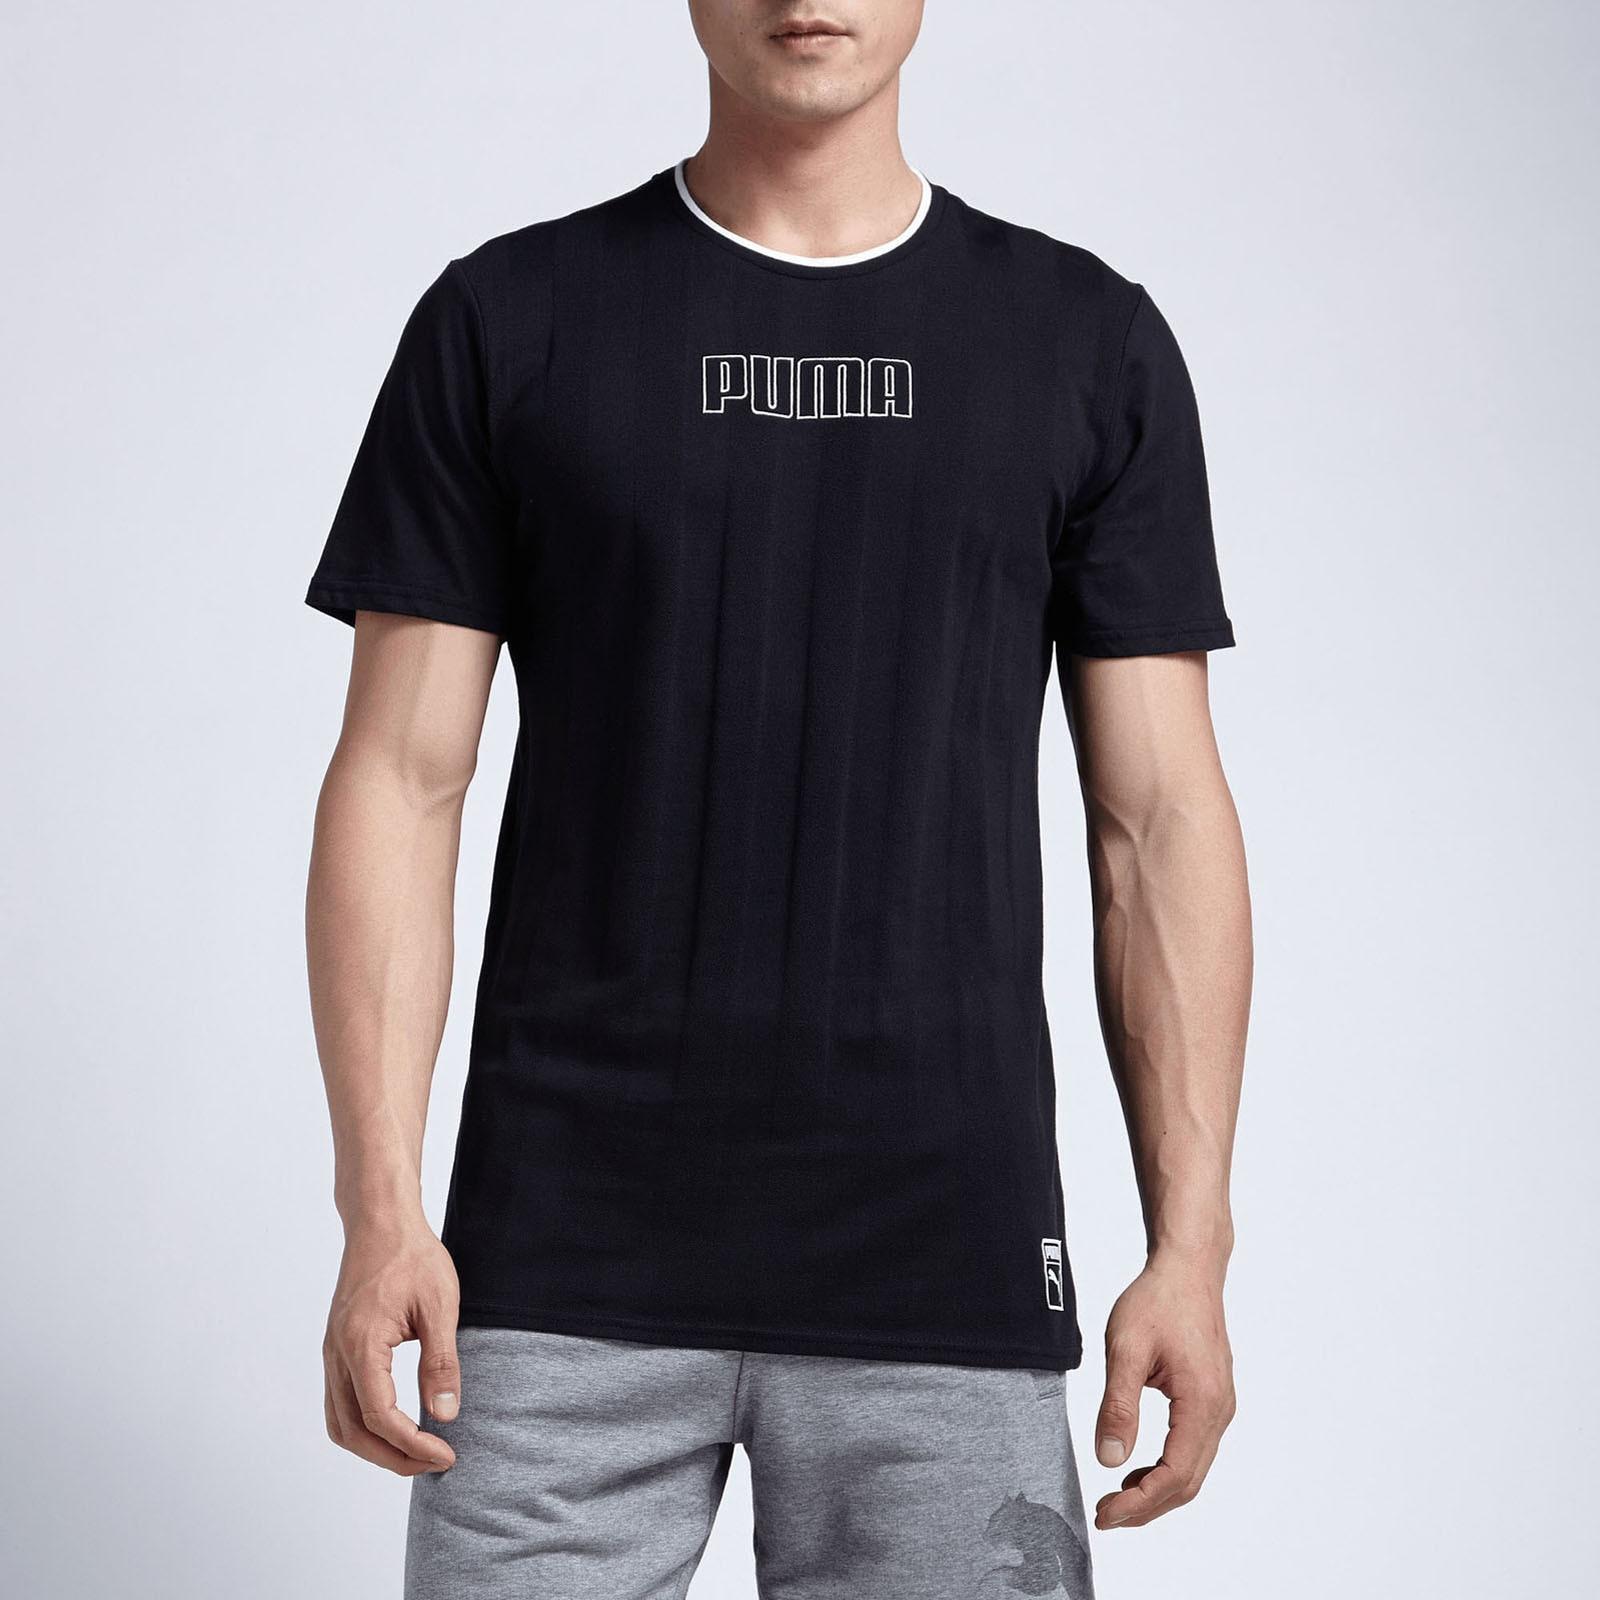 Male T-Shirt PUMA 57499701 sports and entertainment for men men s quartz leather watch male wristwatch relogio masculino relojes big dial watches men luxury brand holuns 2017 reloj hombre